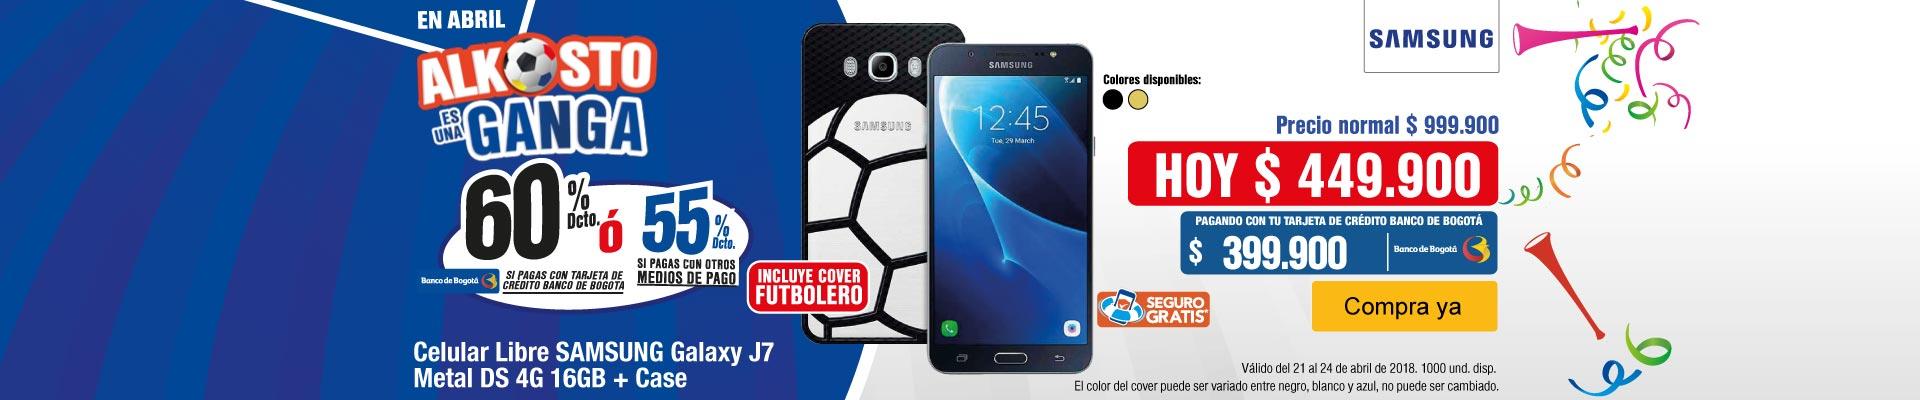 AK-PPAL-2-celulares-PP---Samsung-J7Mundial-Abr21